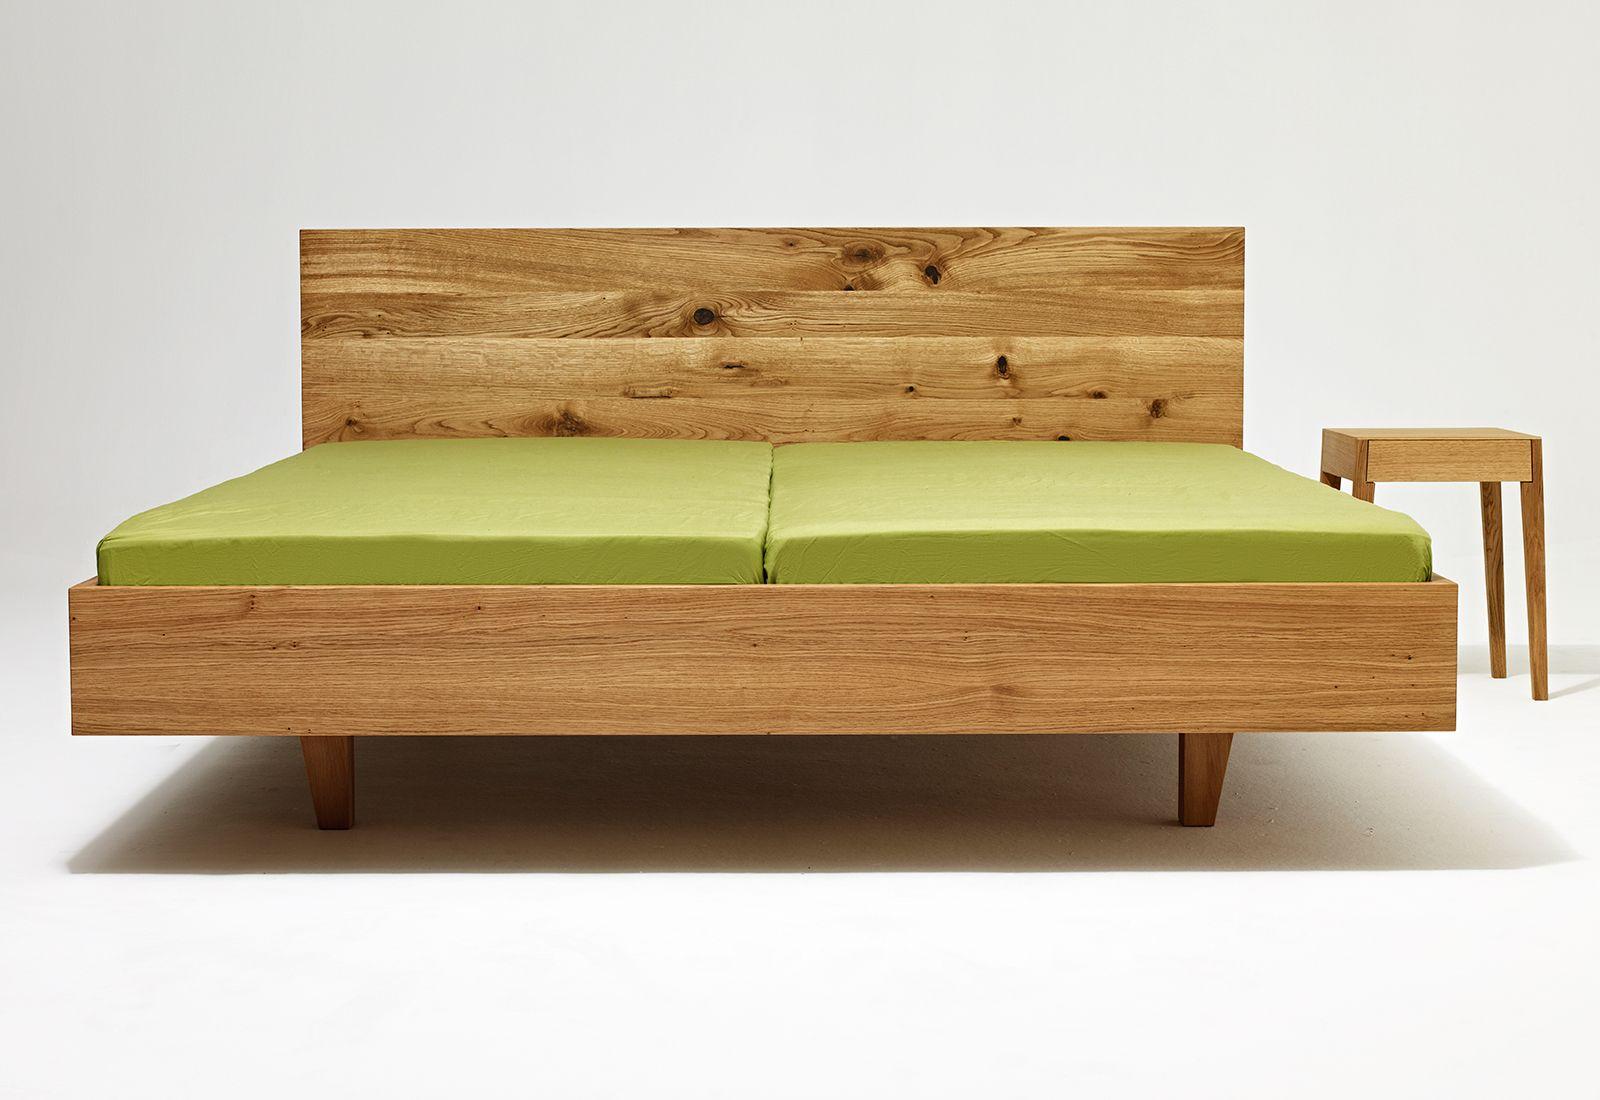 vollholzbett MAMMA wood sixay furniture designermöbel